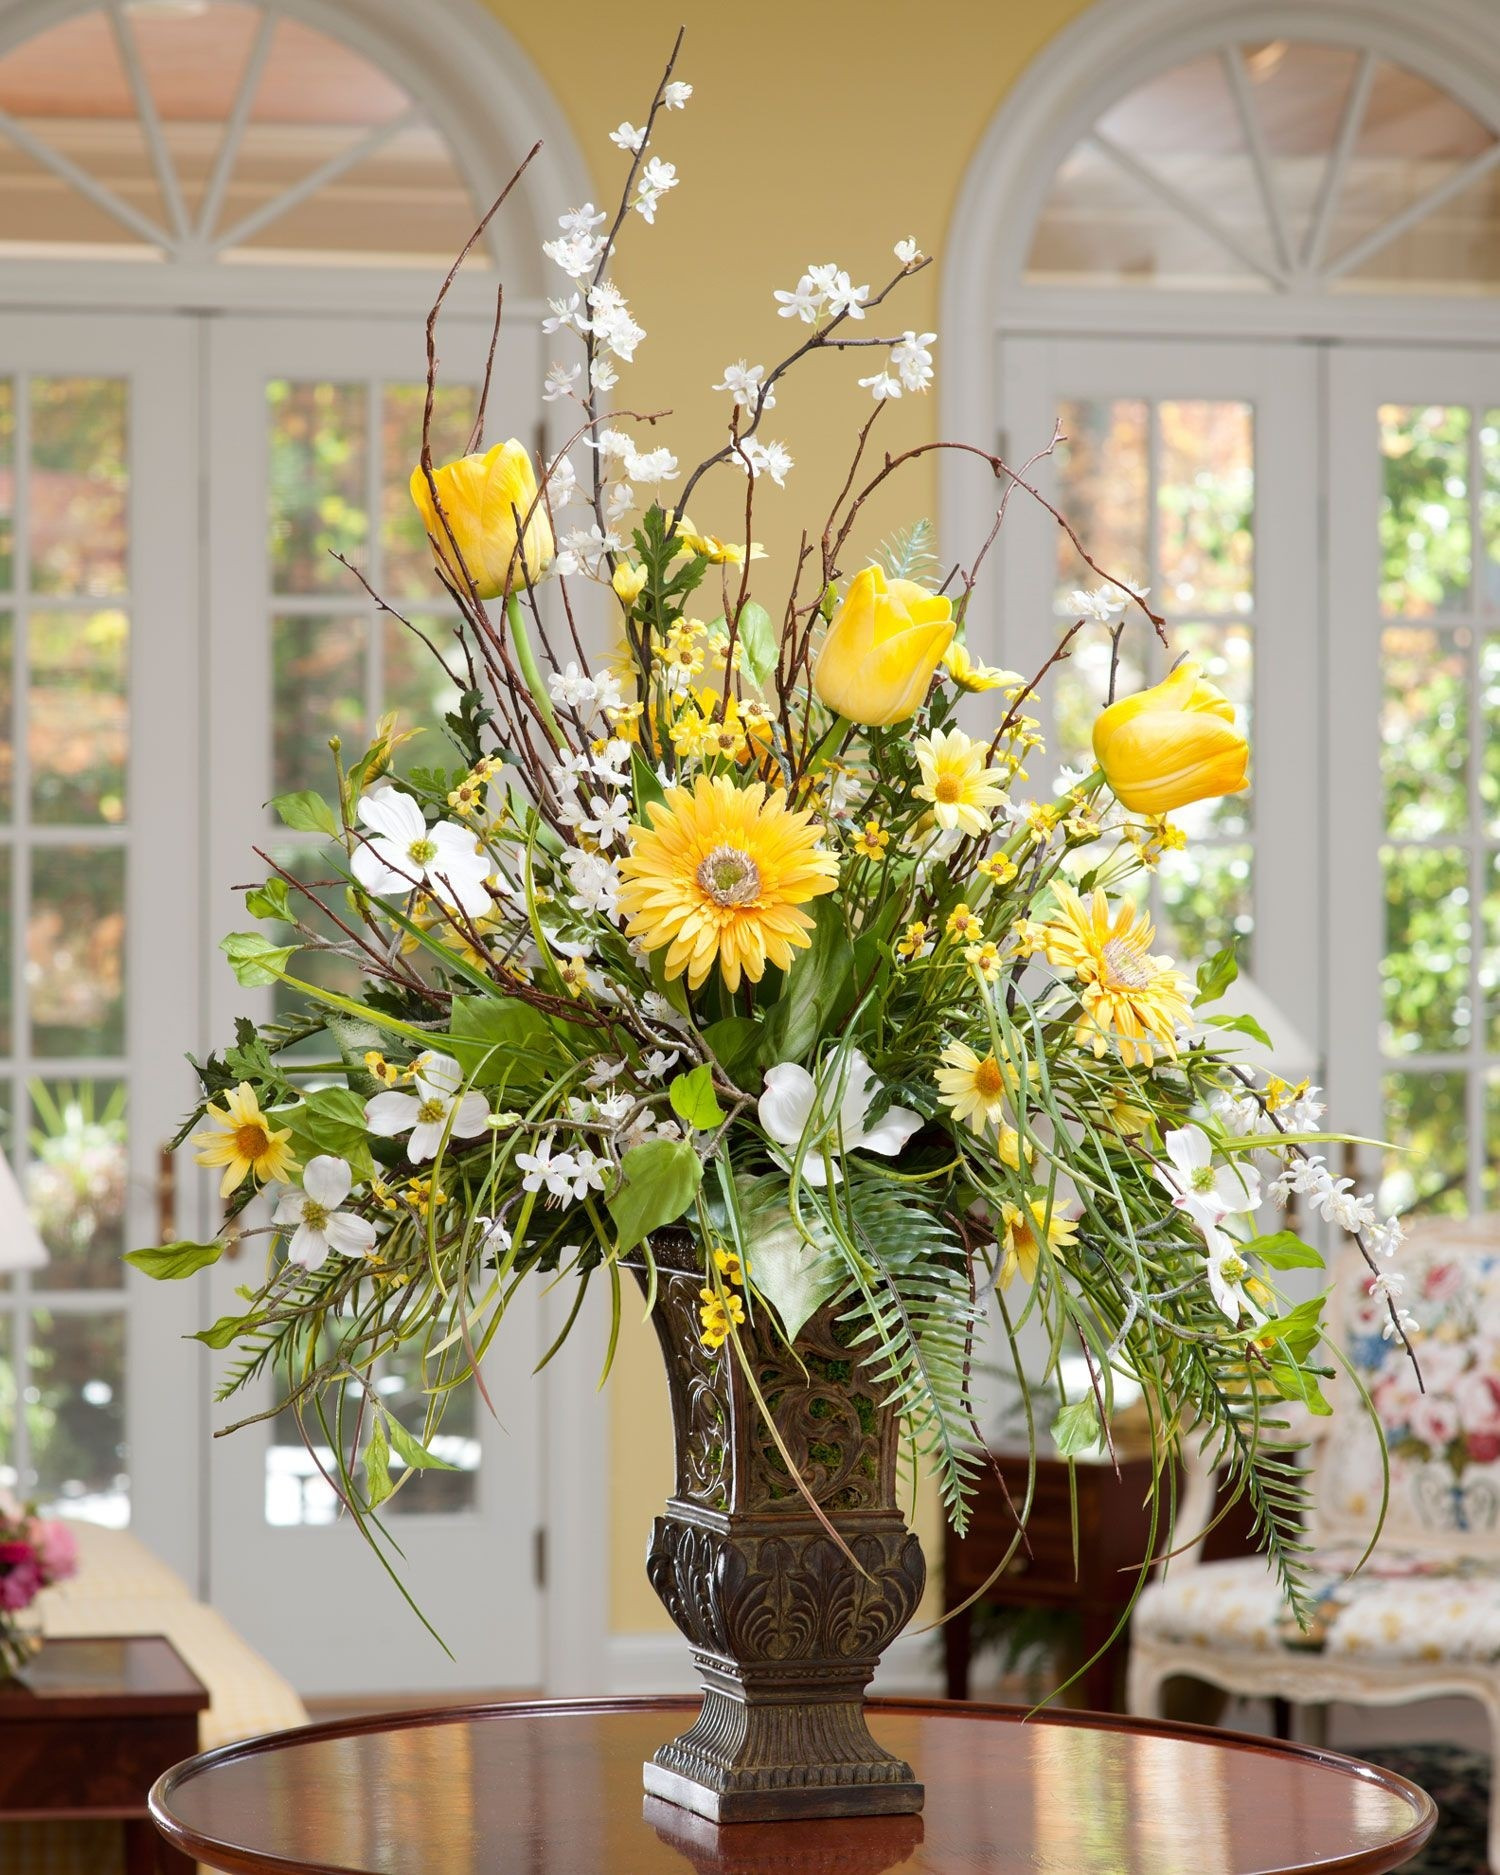 225 & Silk Flower Arrangements In Vases - Ideas on Foter